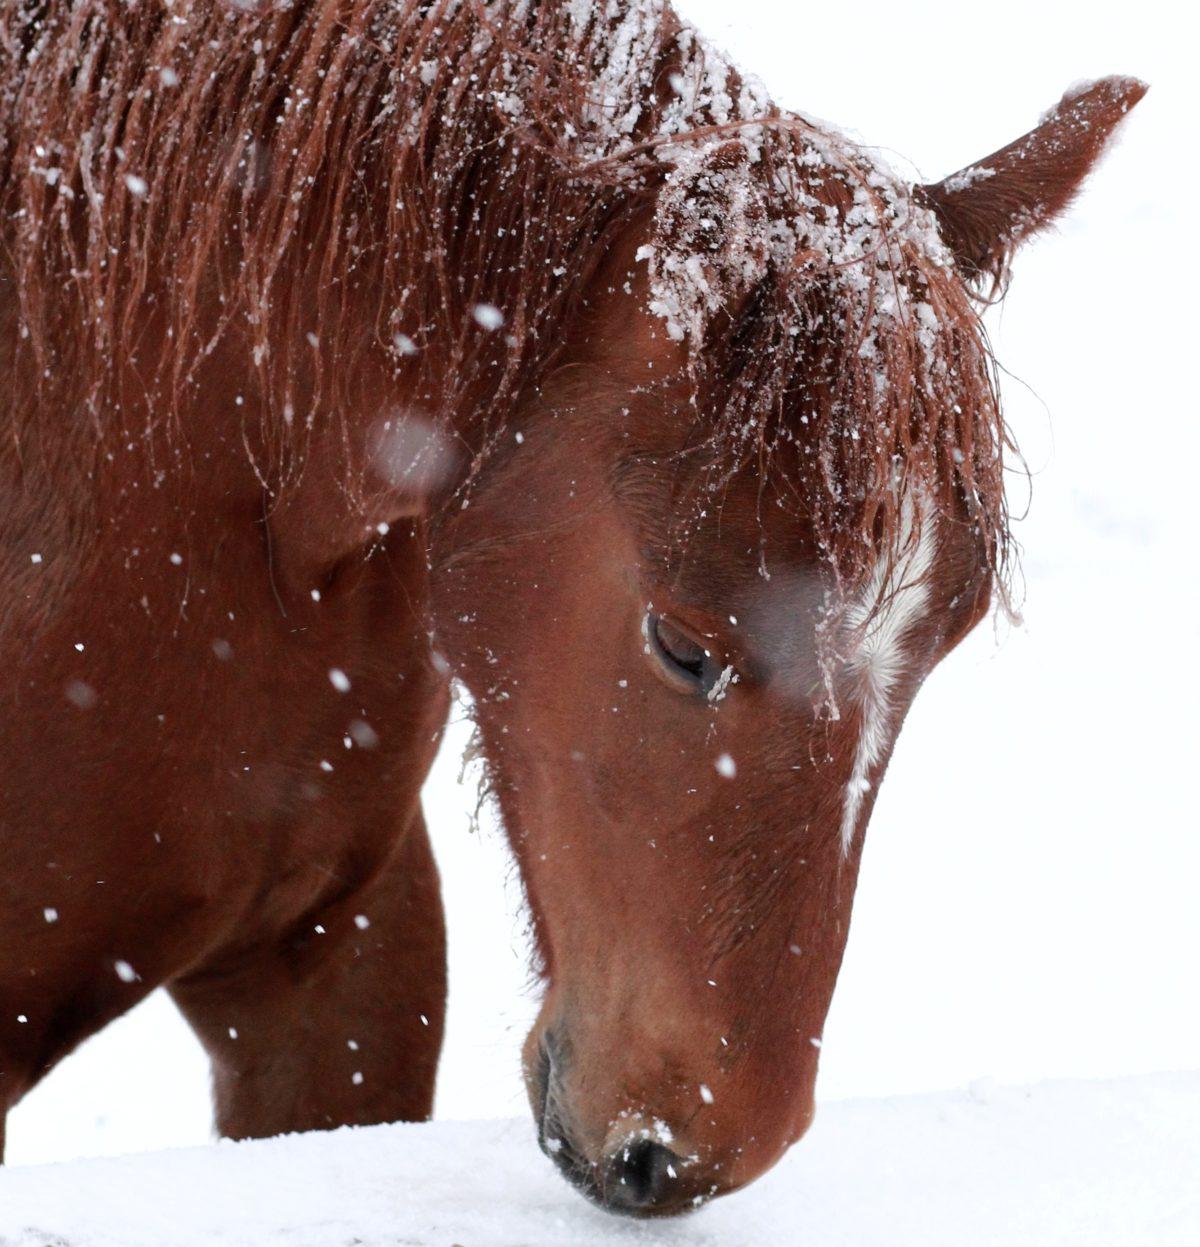 <em>snowy mustang</em>